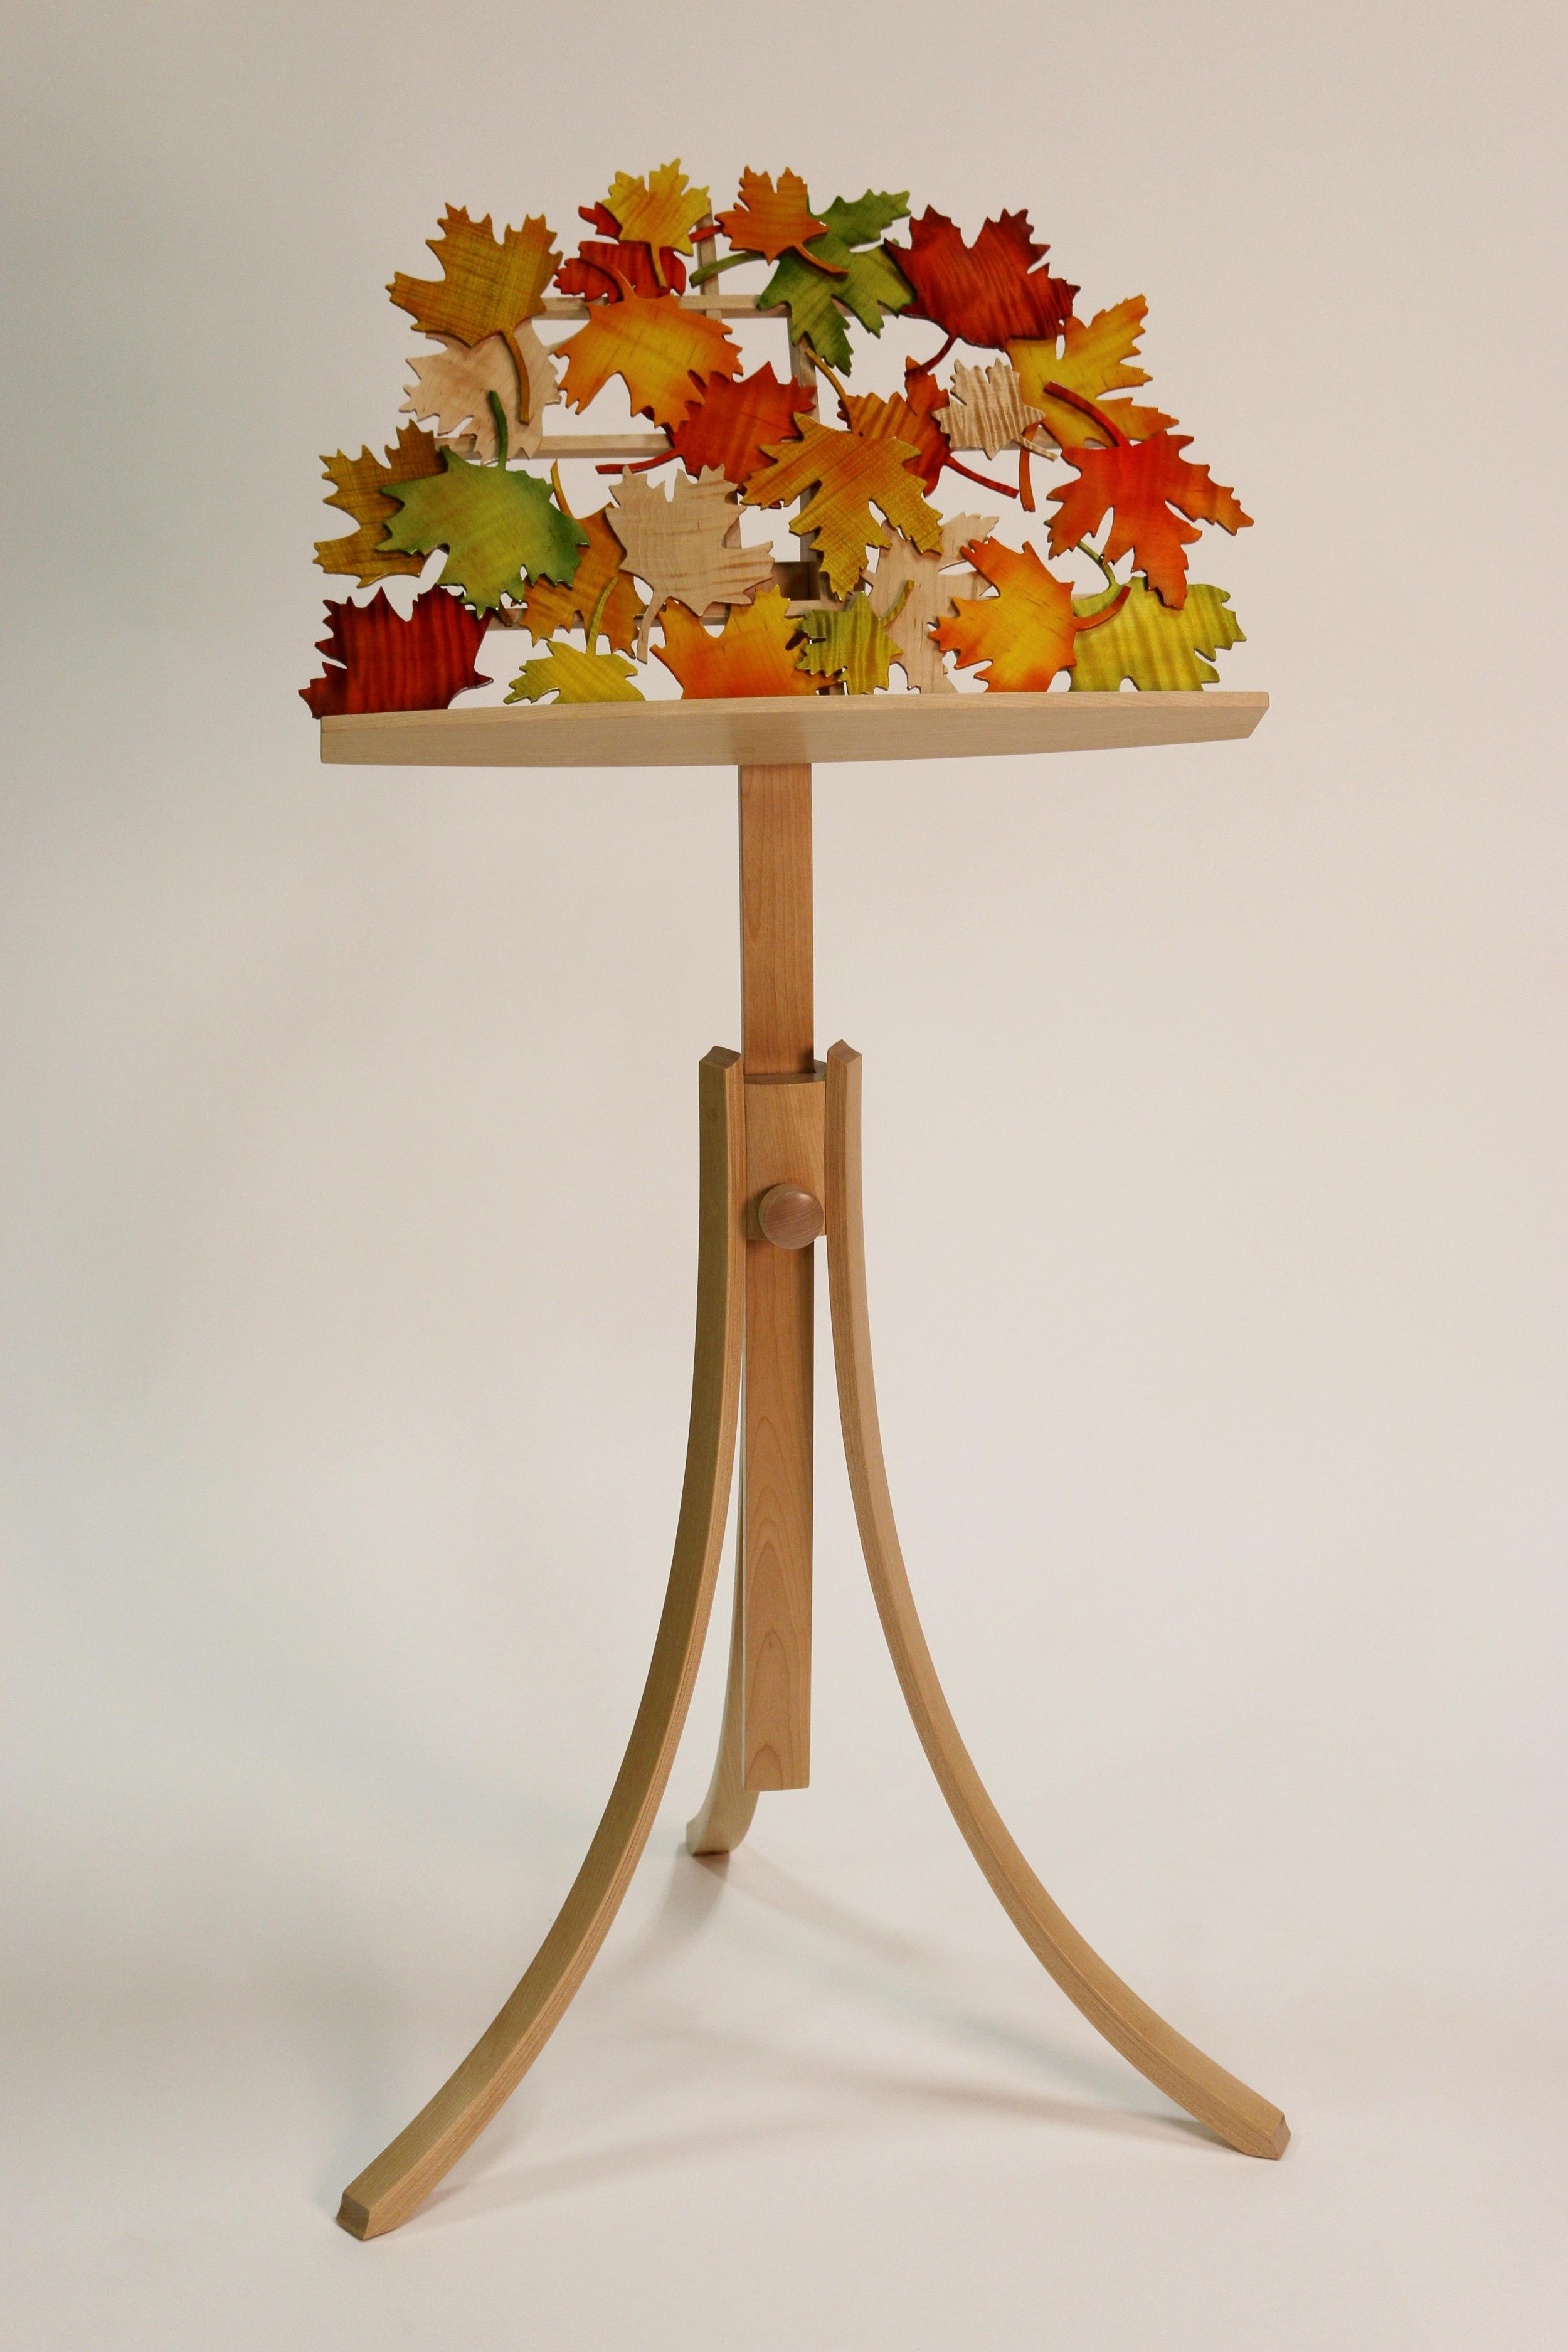 Autumn Leaves - Birch Stand